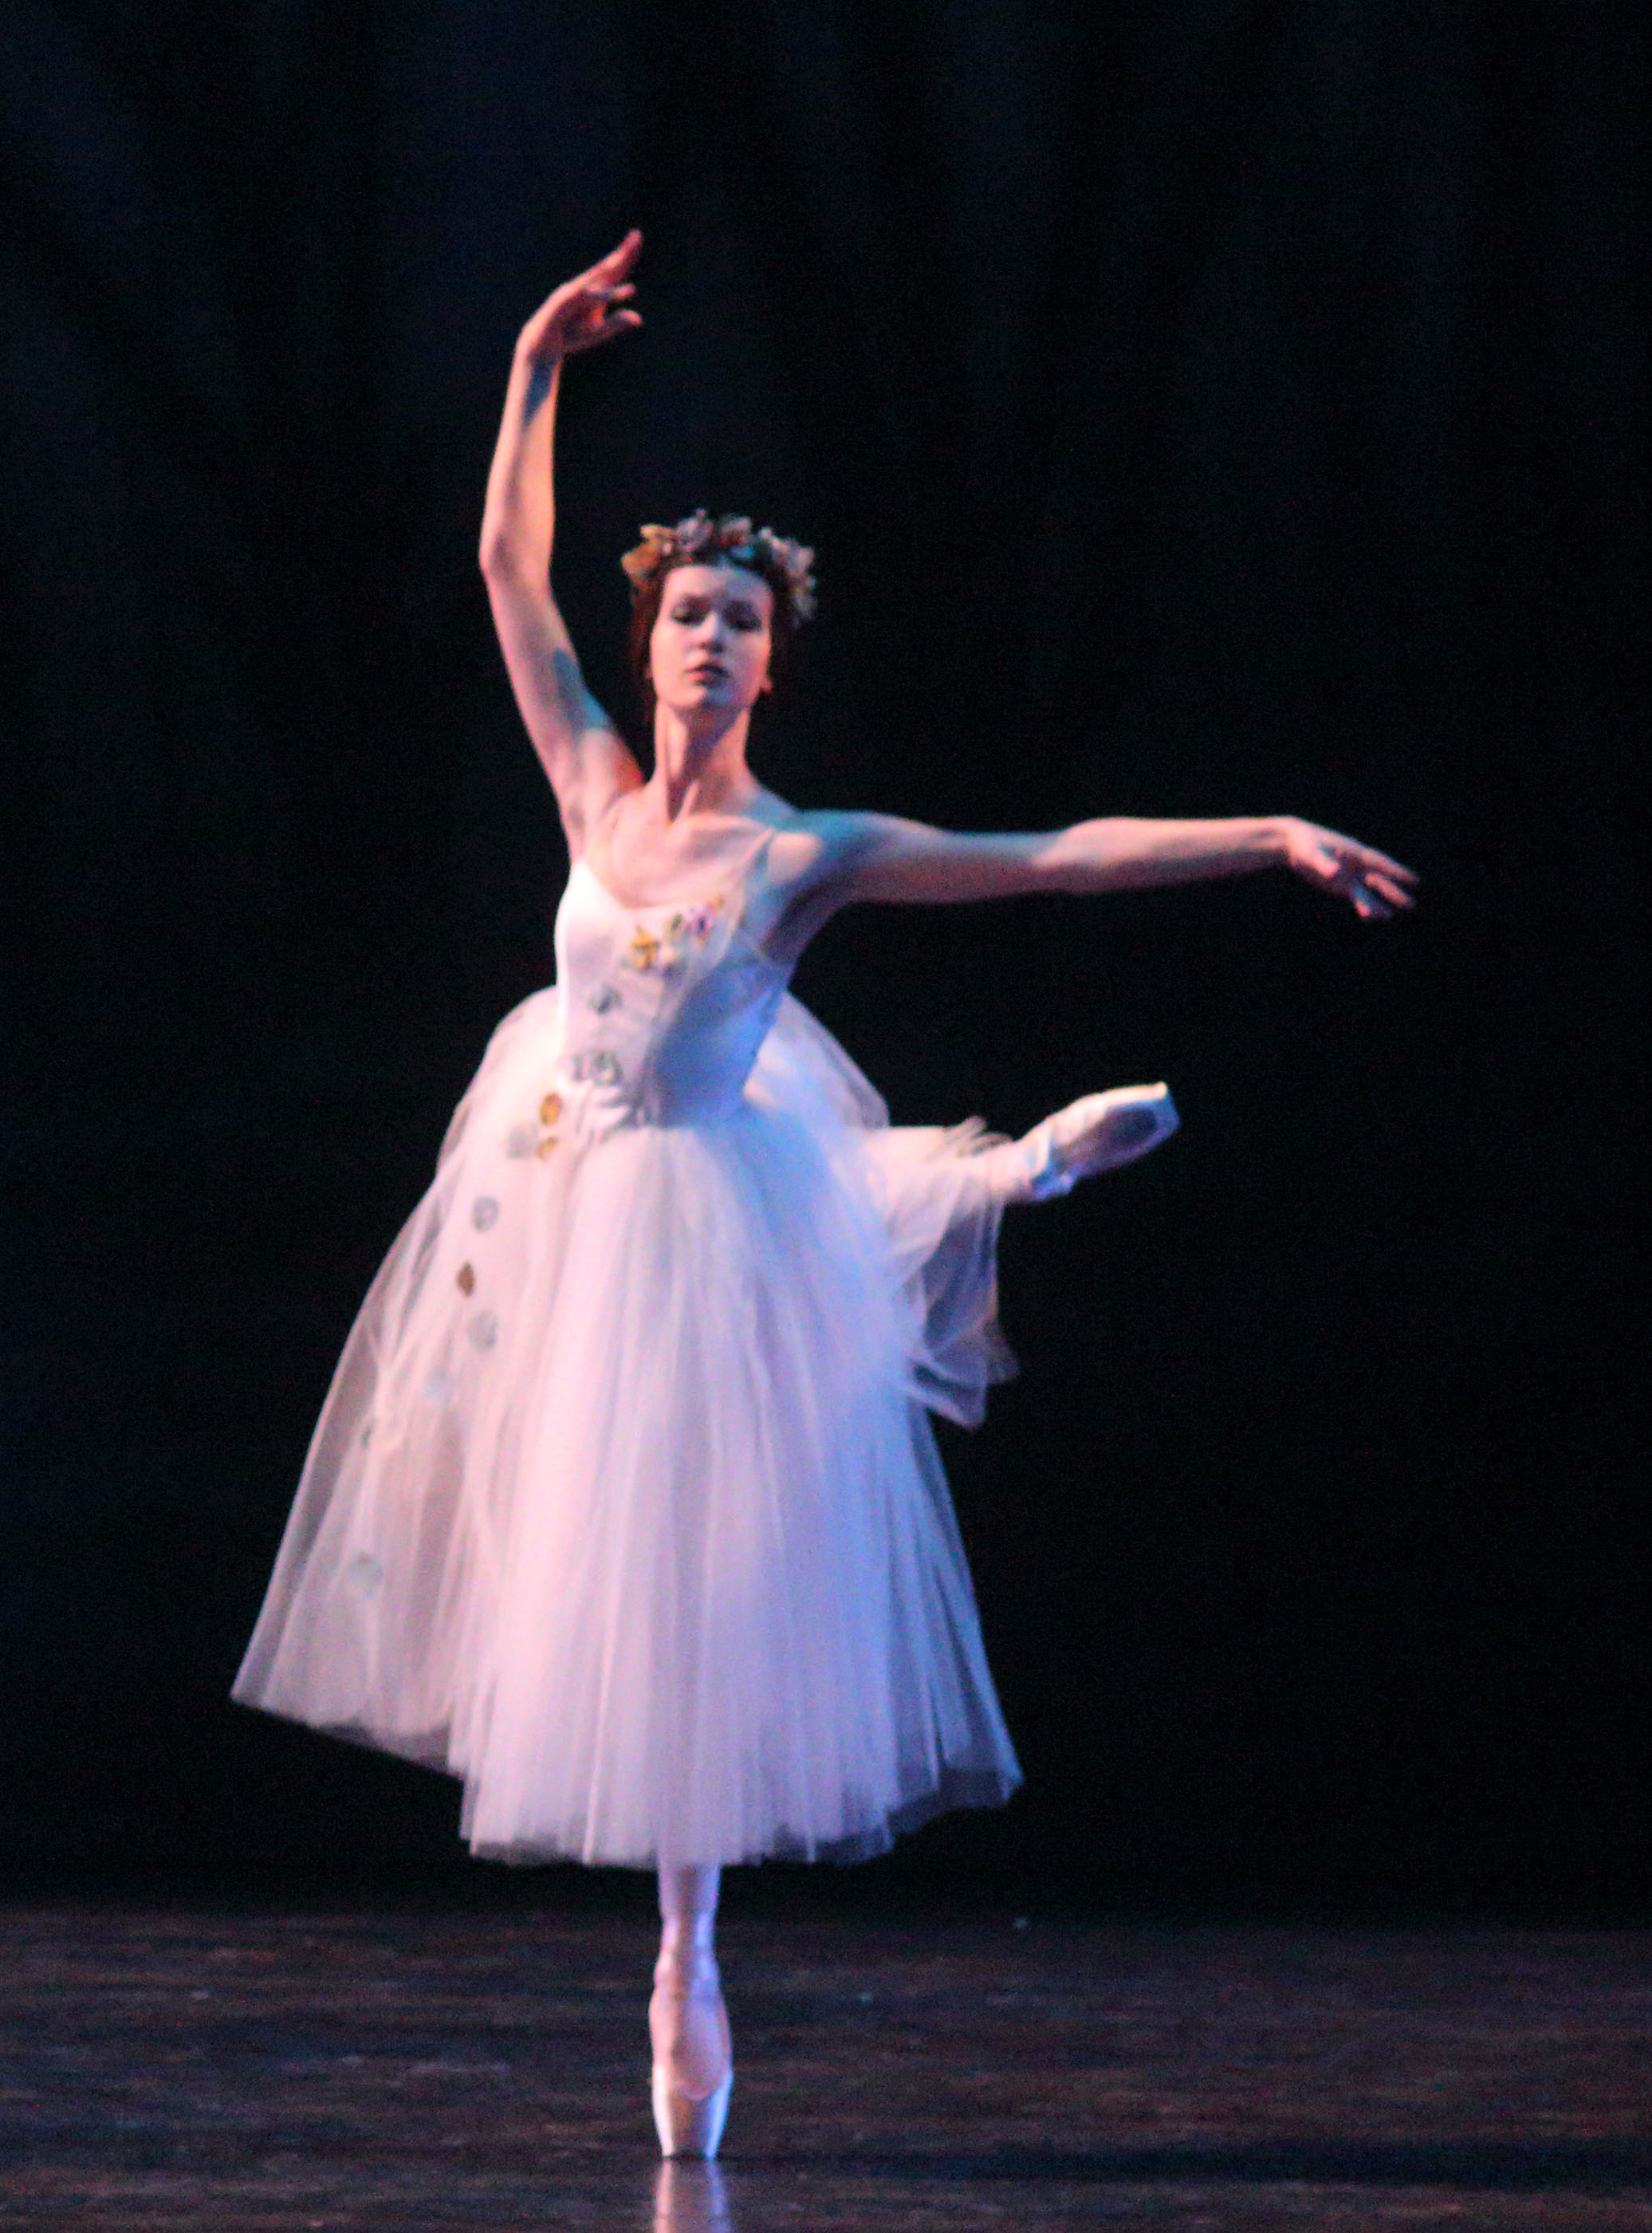 Zoa Glab as Wili Moyna